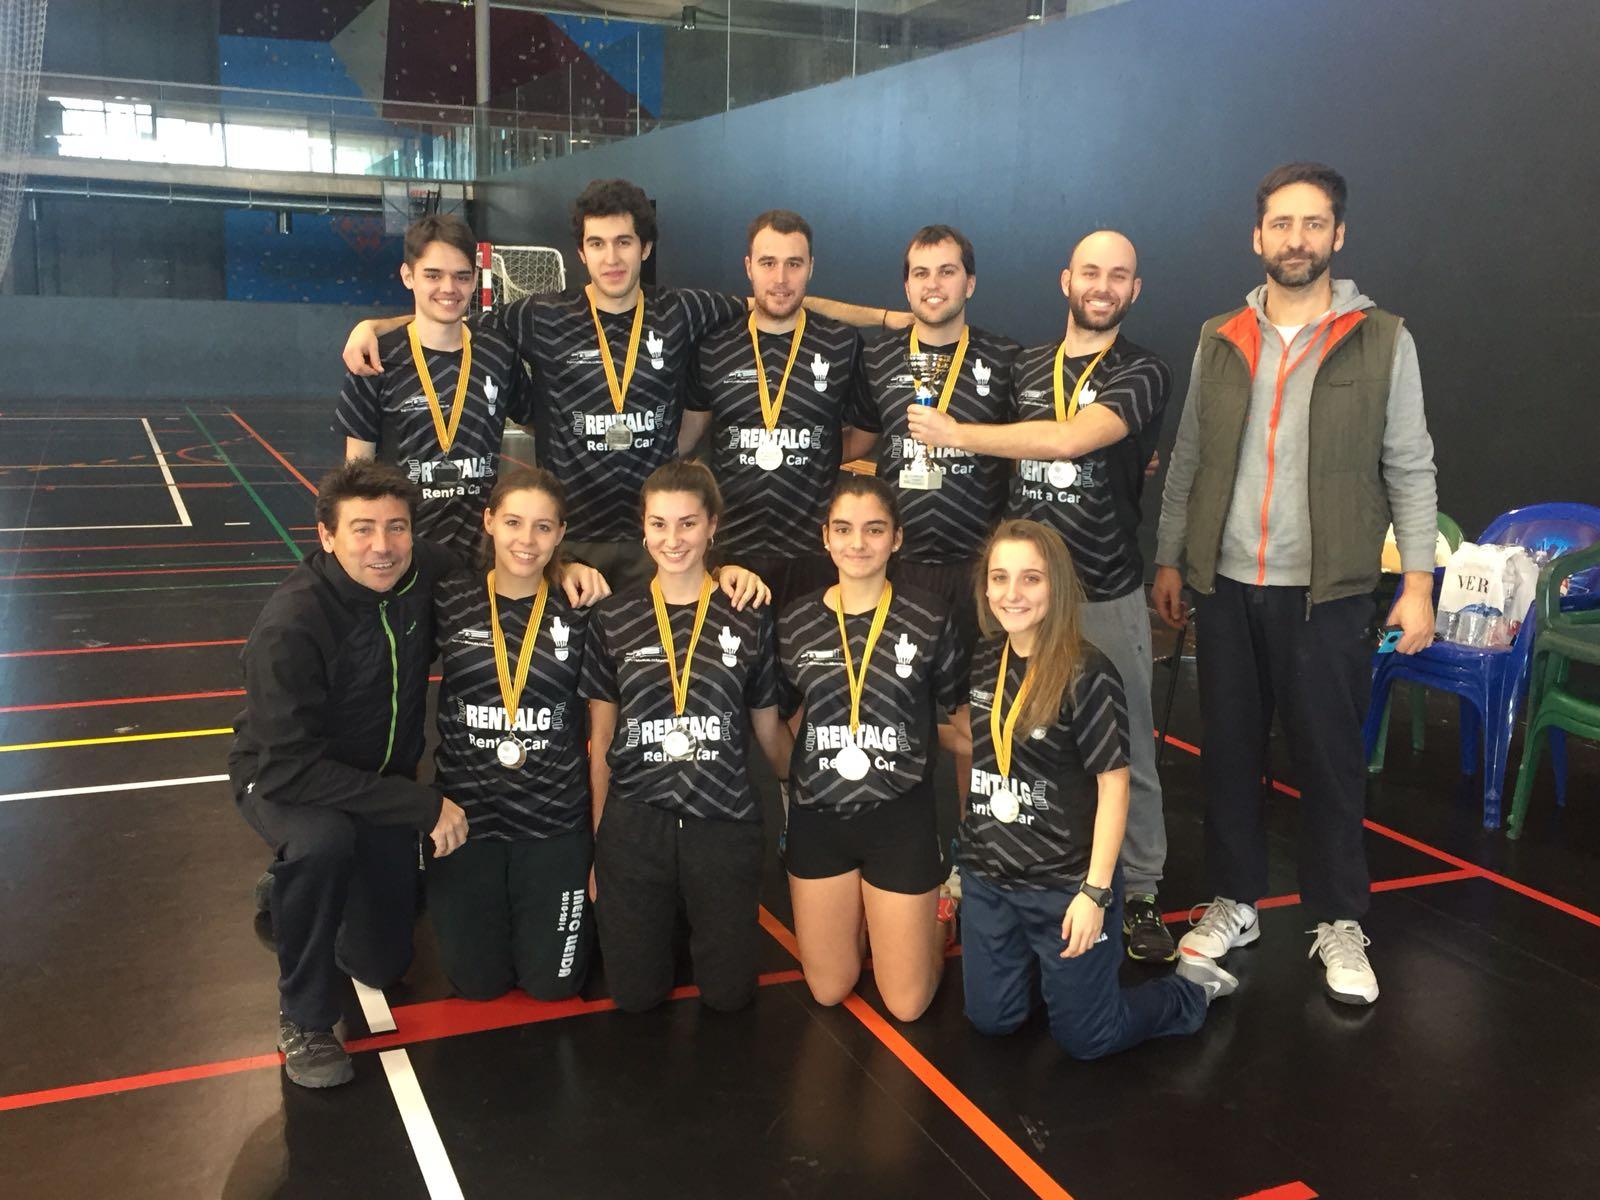 Equipo de Bádminton Lleida 2017-2018